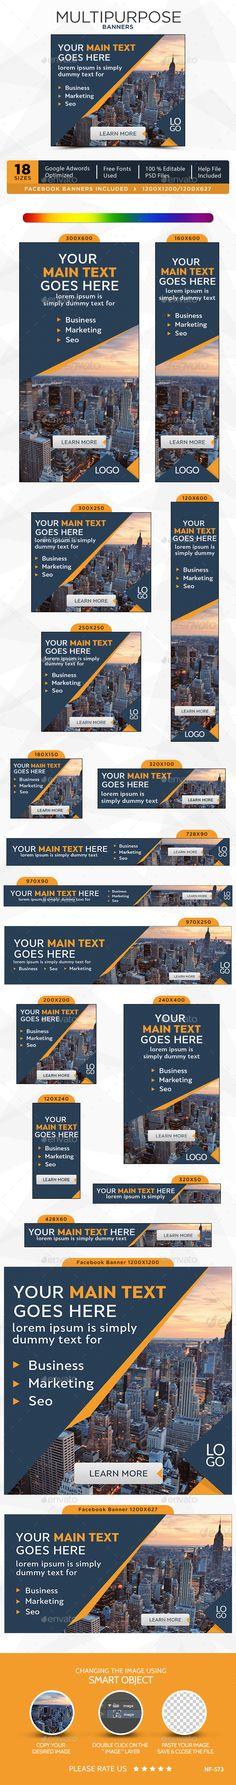 Multipurpose Banners Template #design #ads #web Download: http://graphicriver.net/item/multipurpose-banners/12482725?ref=ksioks